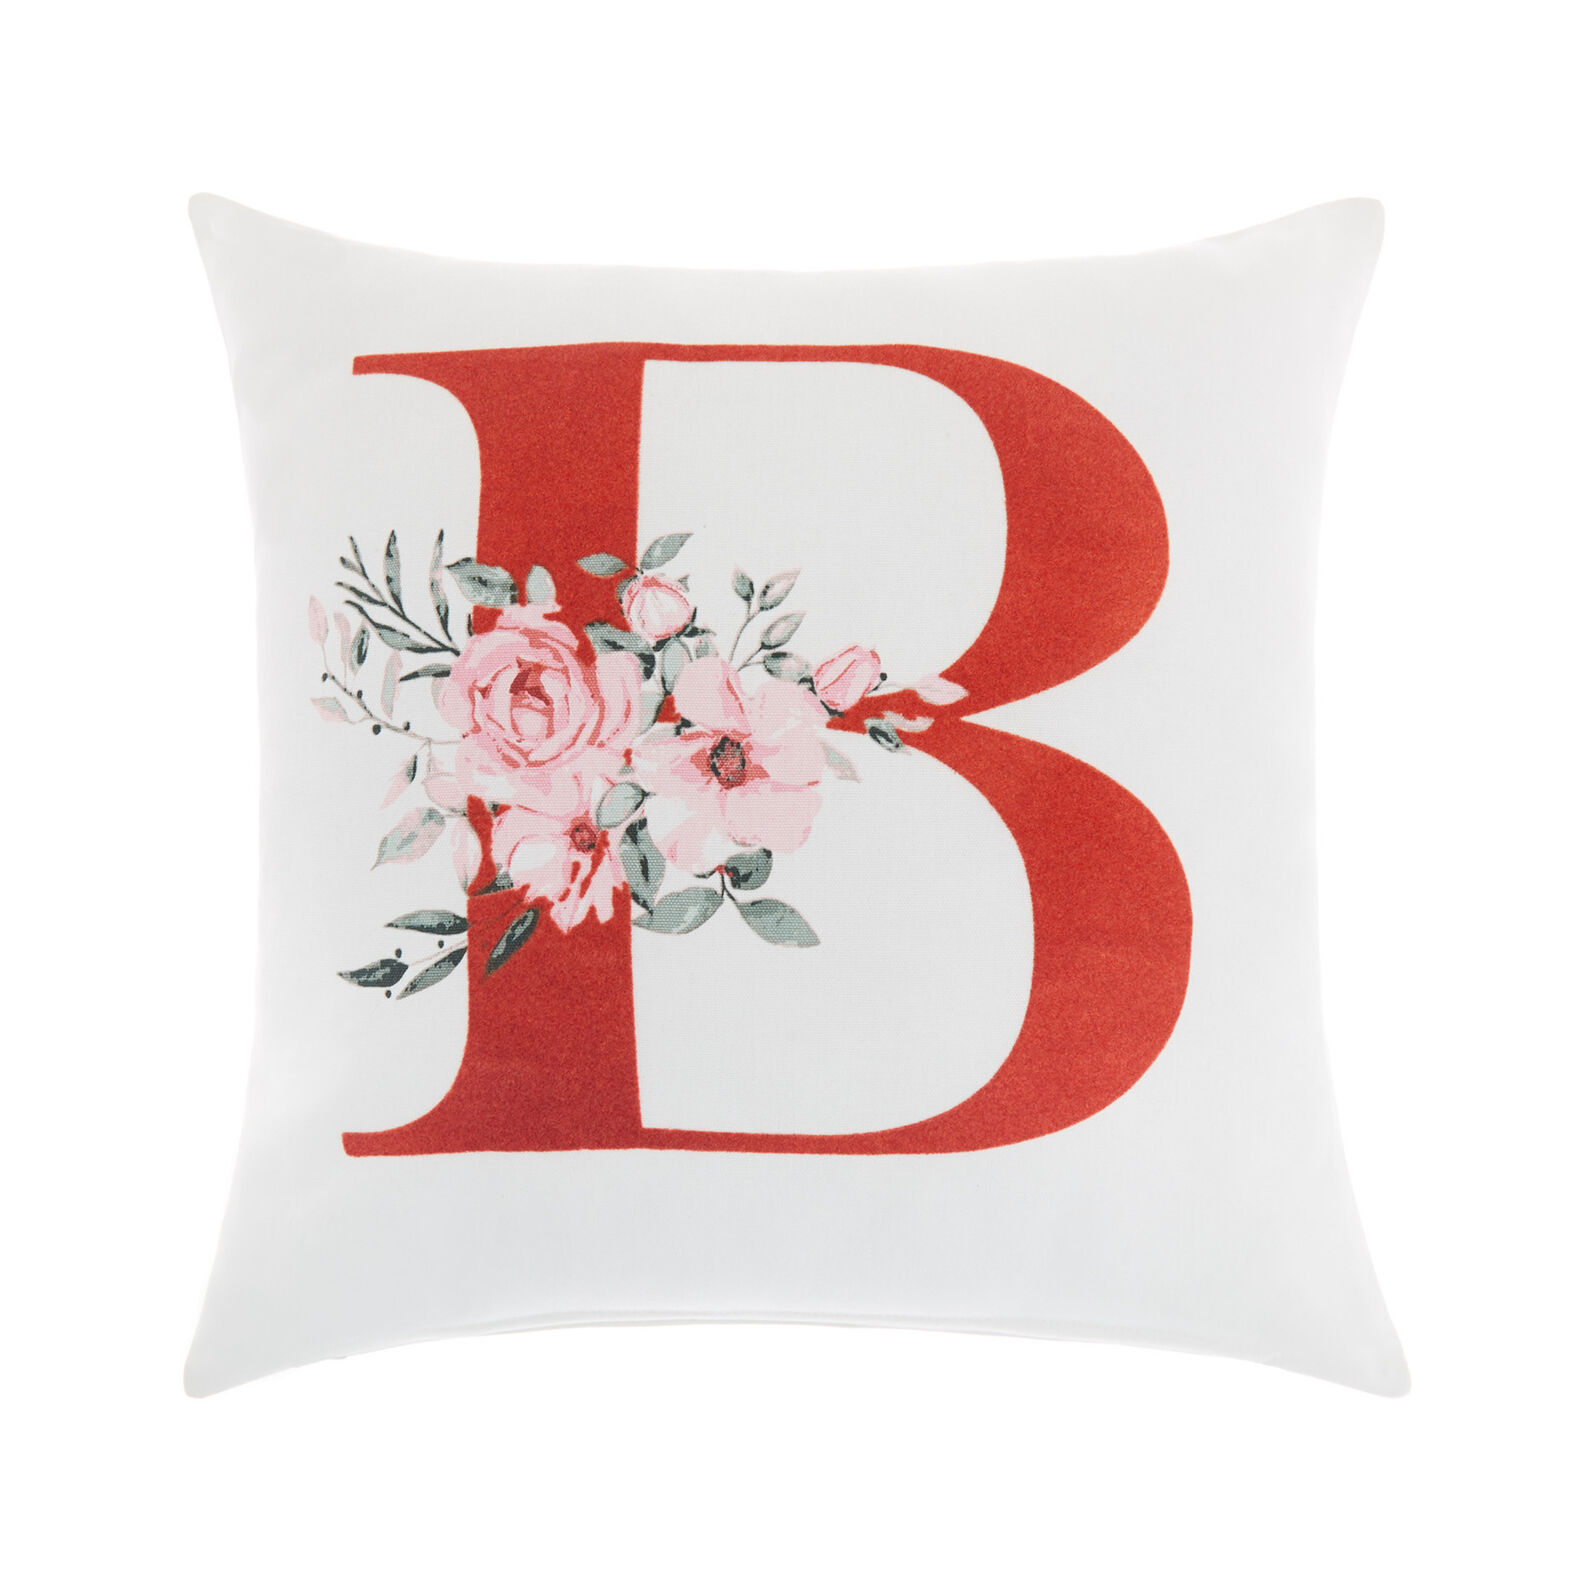 Cotton cushion cover with B print 45x45cm